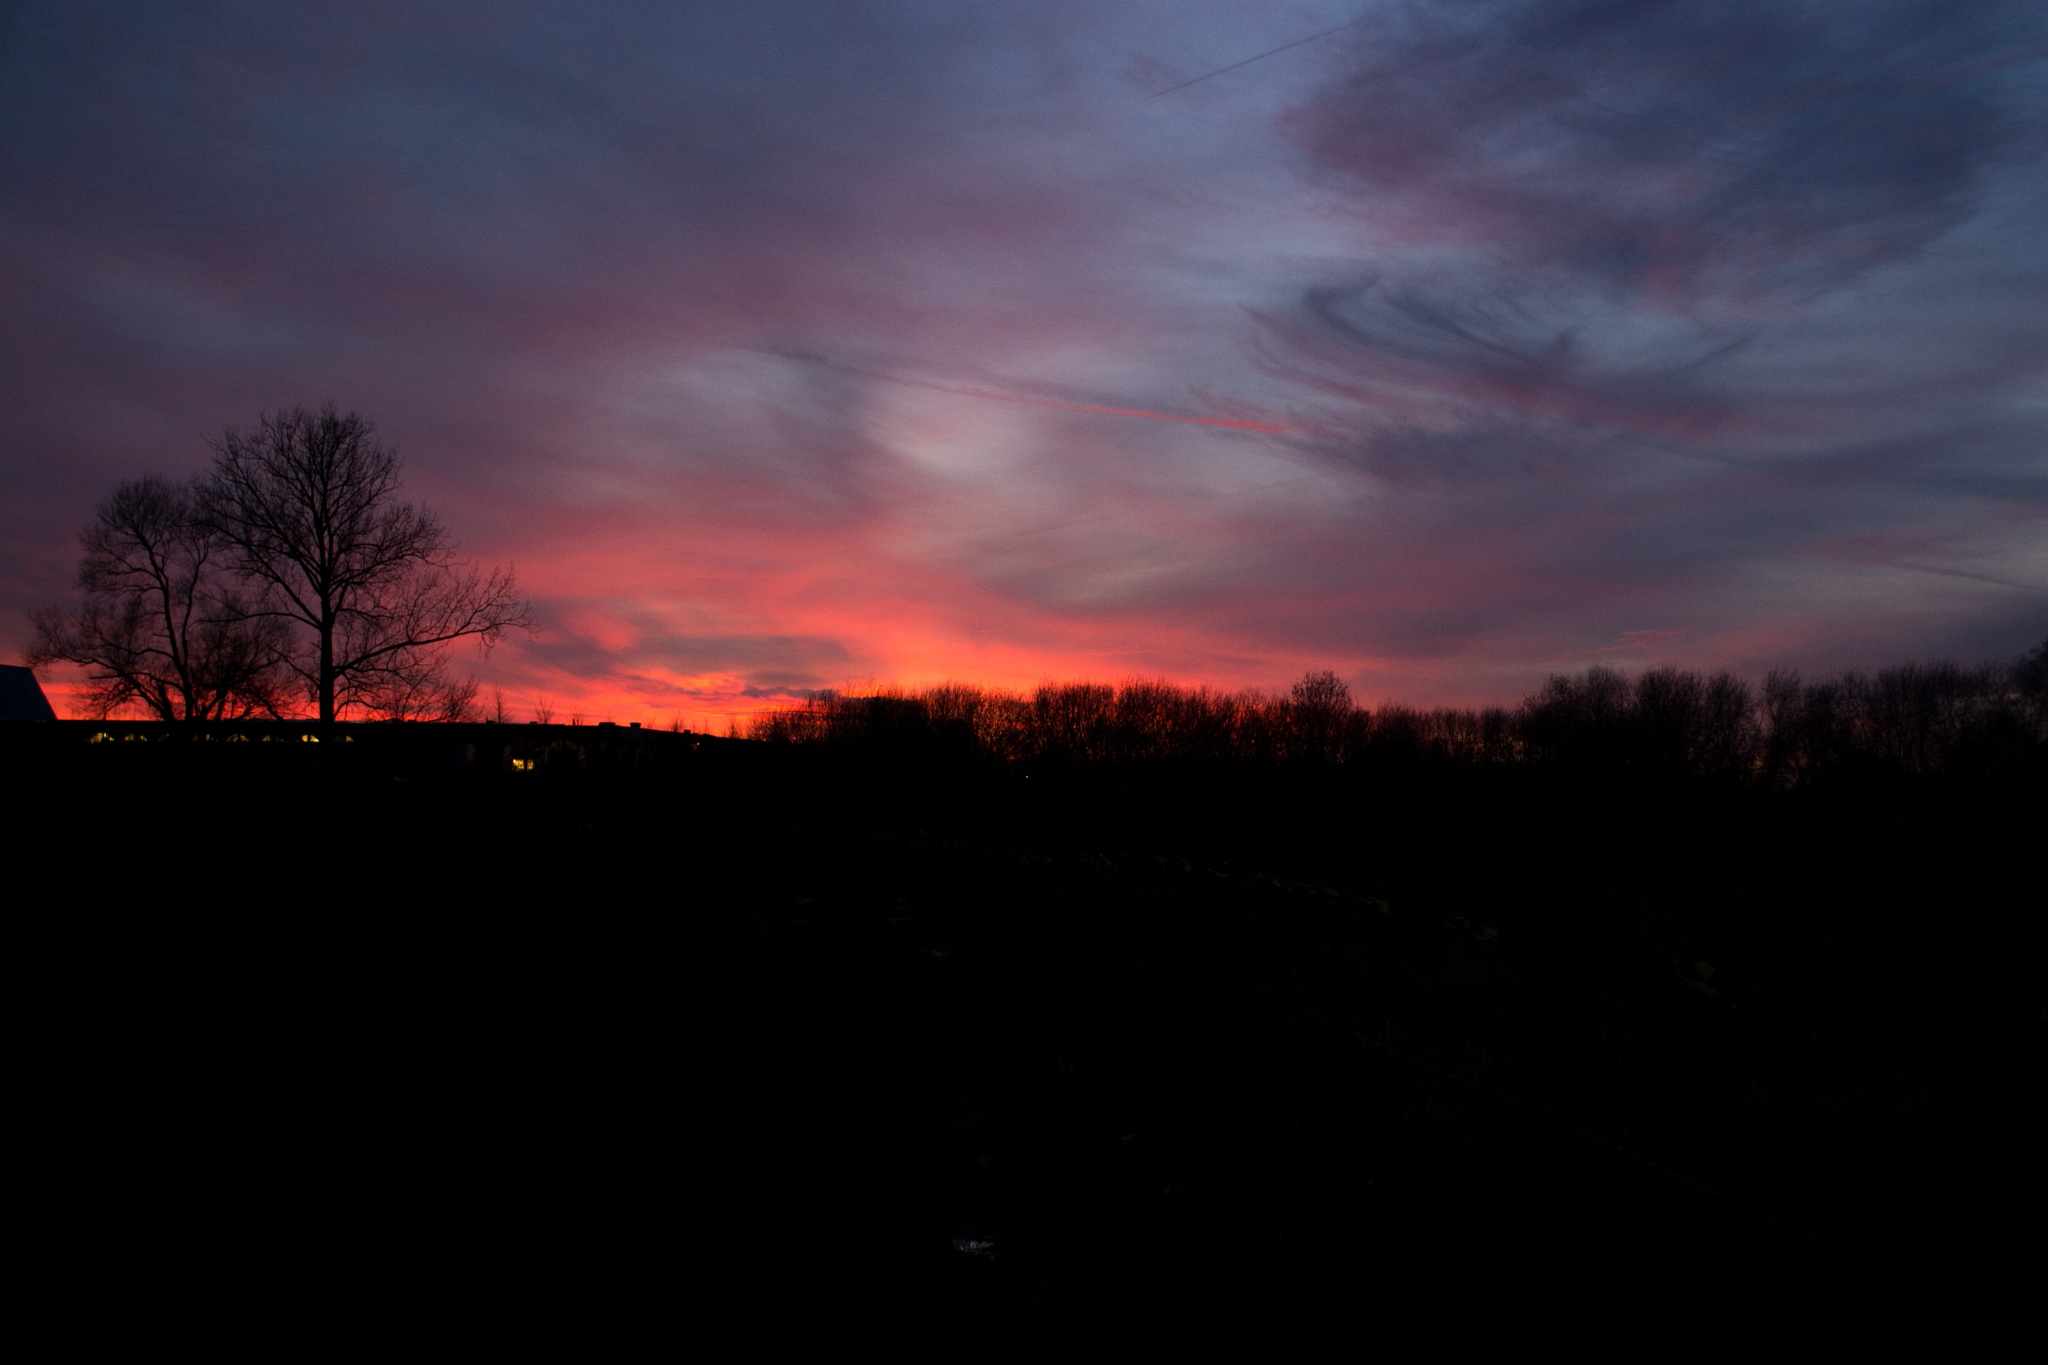 Sunset by Sander